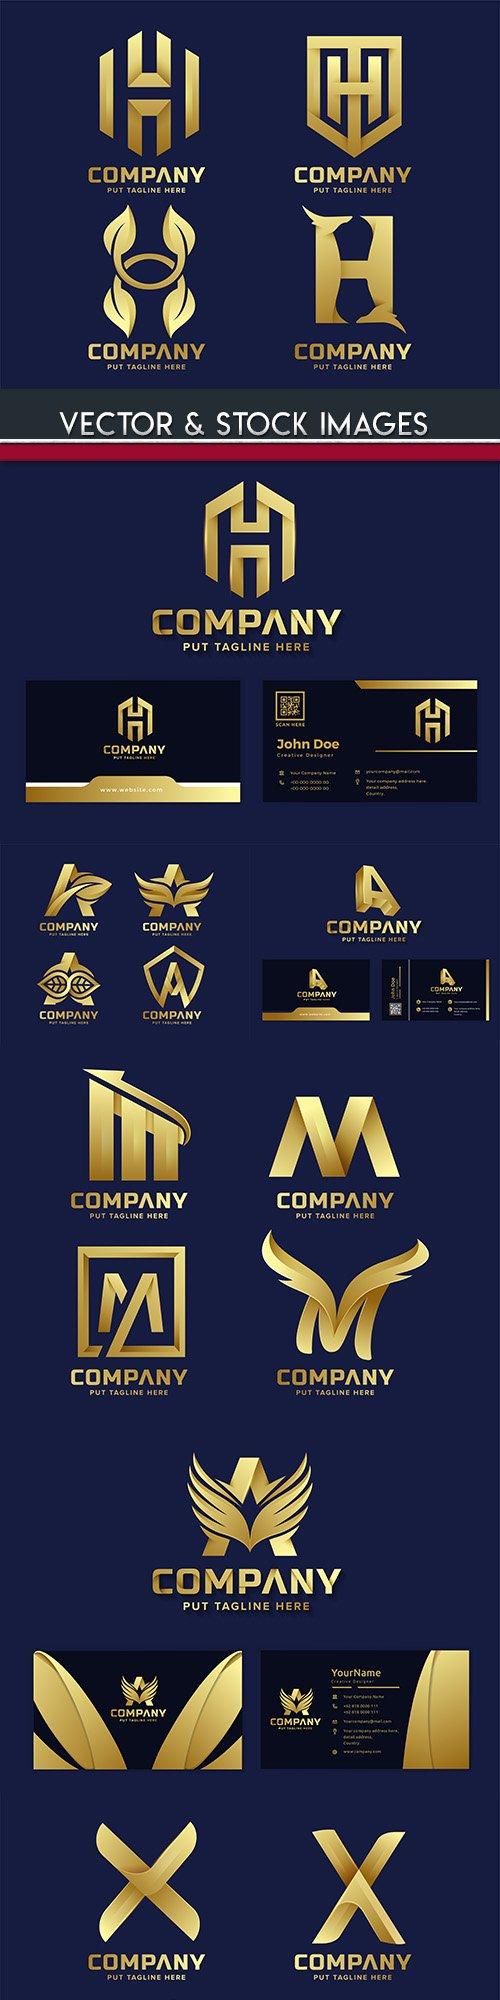 Gold business logos corporate company design 36